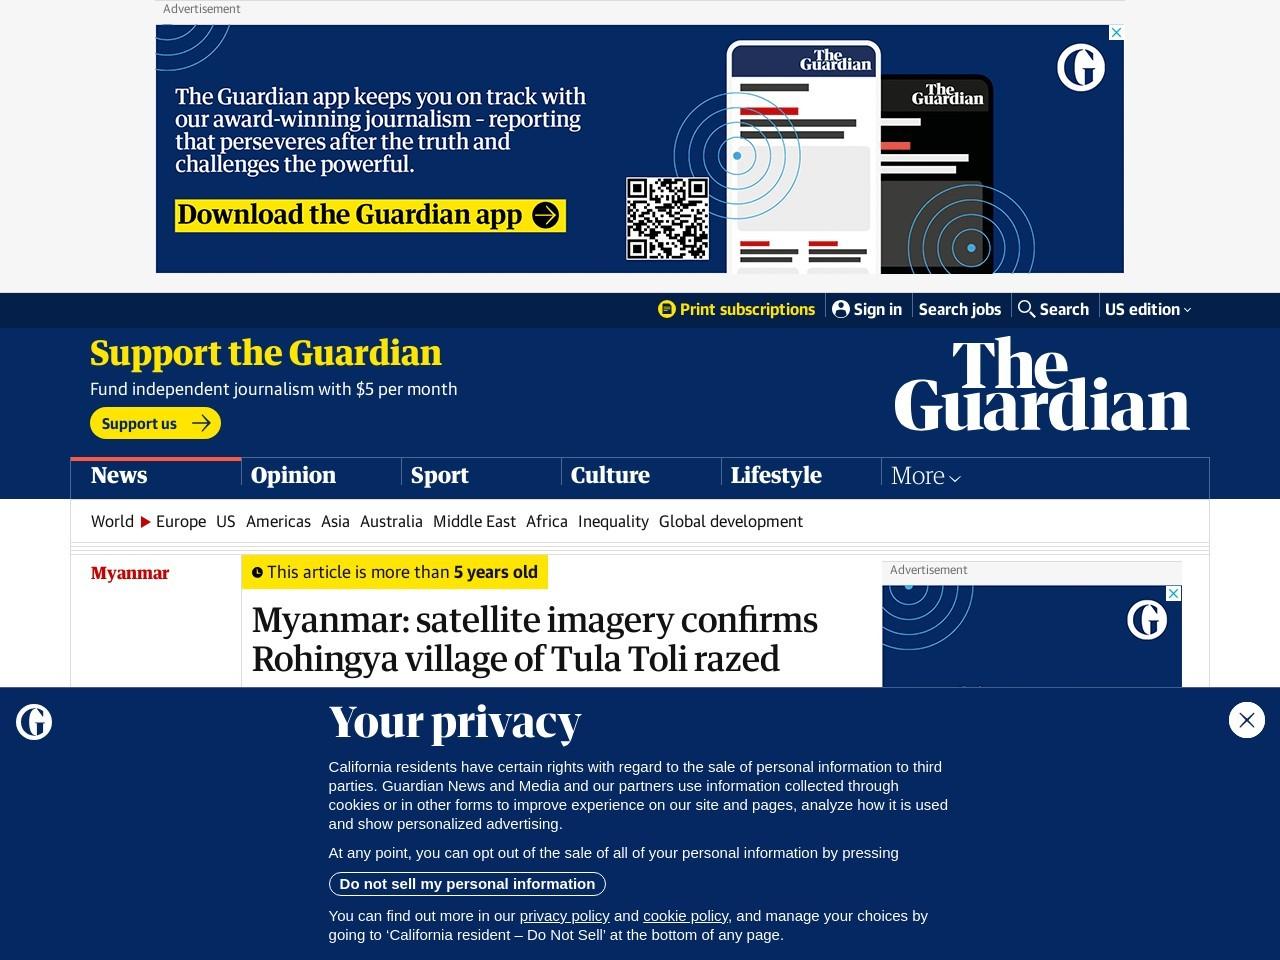 Myanmar: satellite imagery confirms Rohingya village of Tula Toli razed